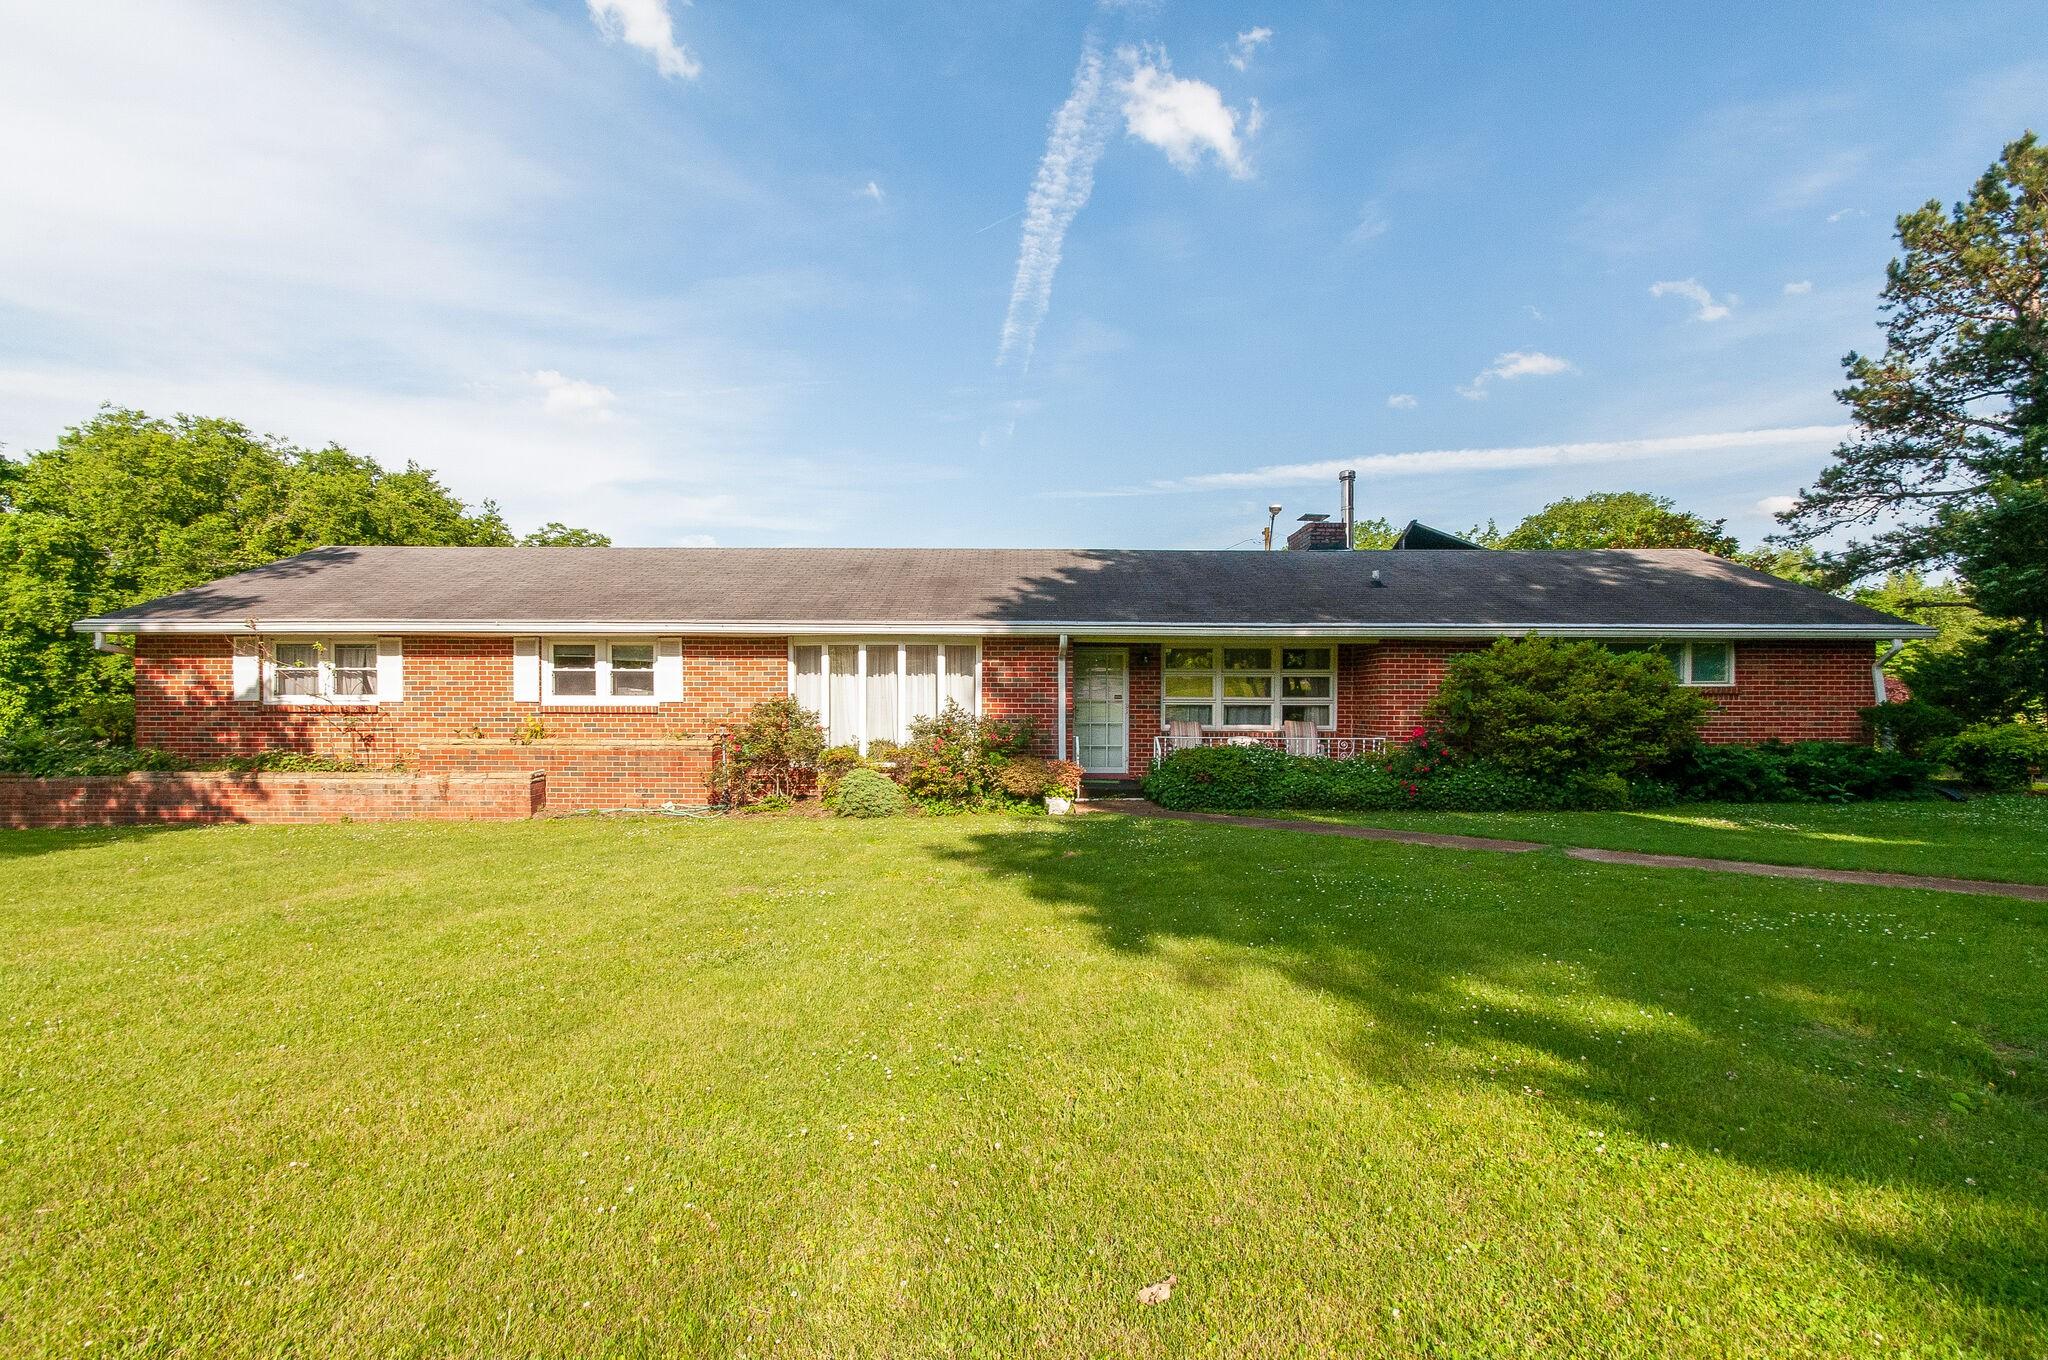 Benson Home Real Estate Listings Main Image